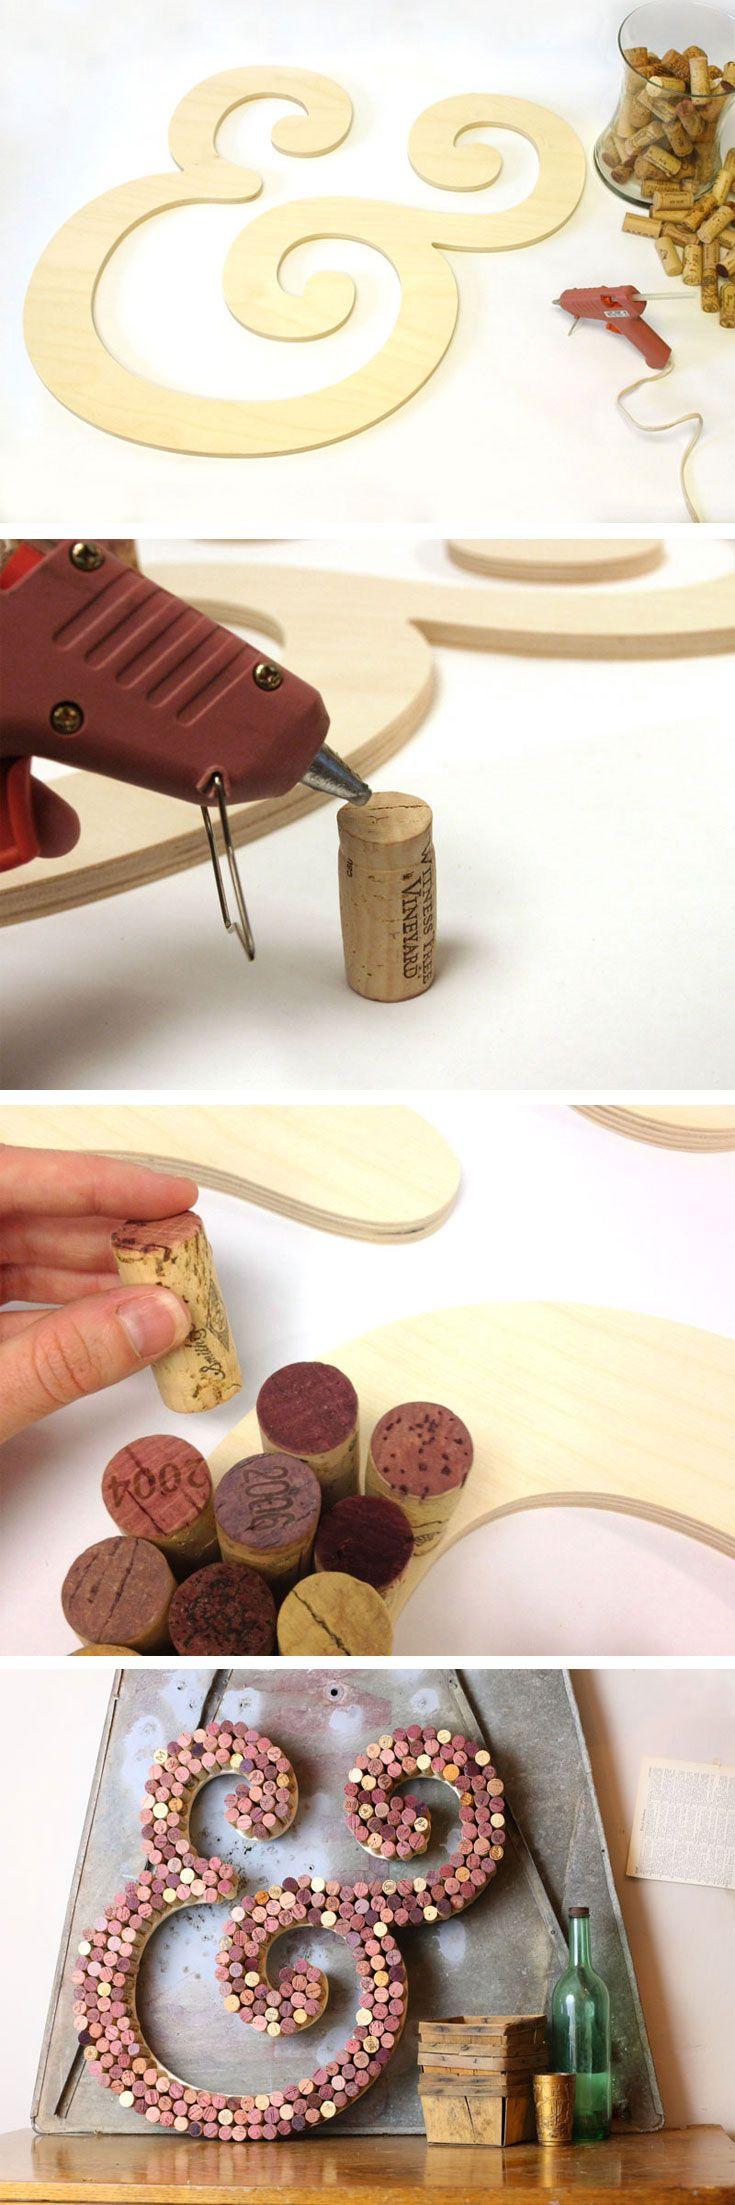 Need cork ampersand DIY » Fun gift idea.